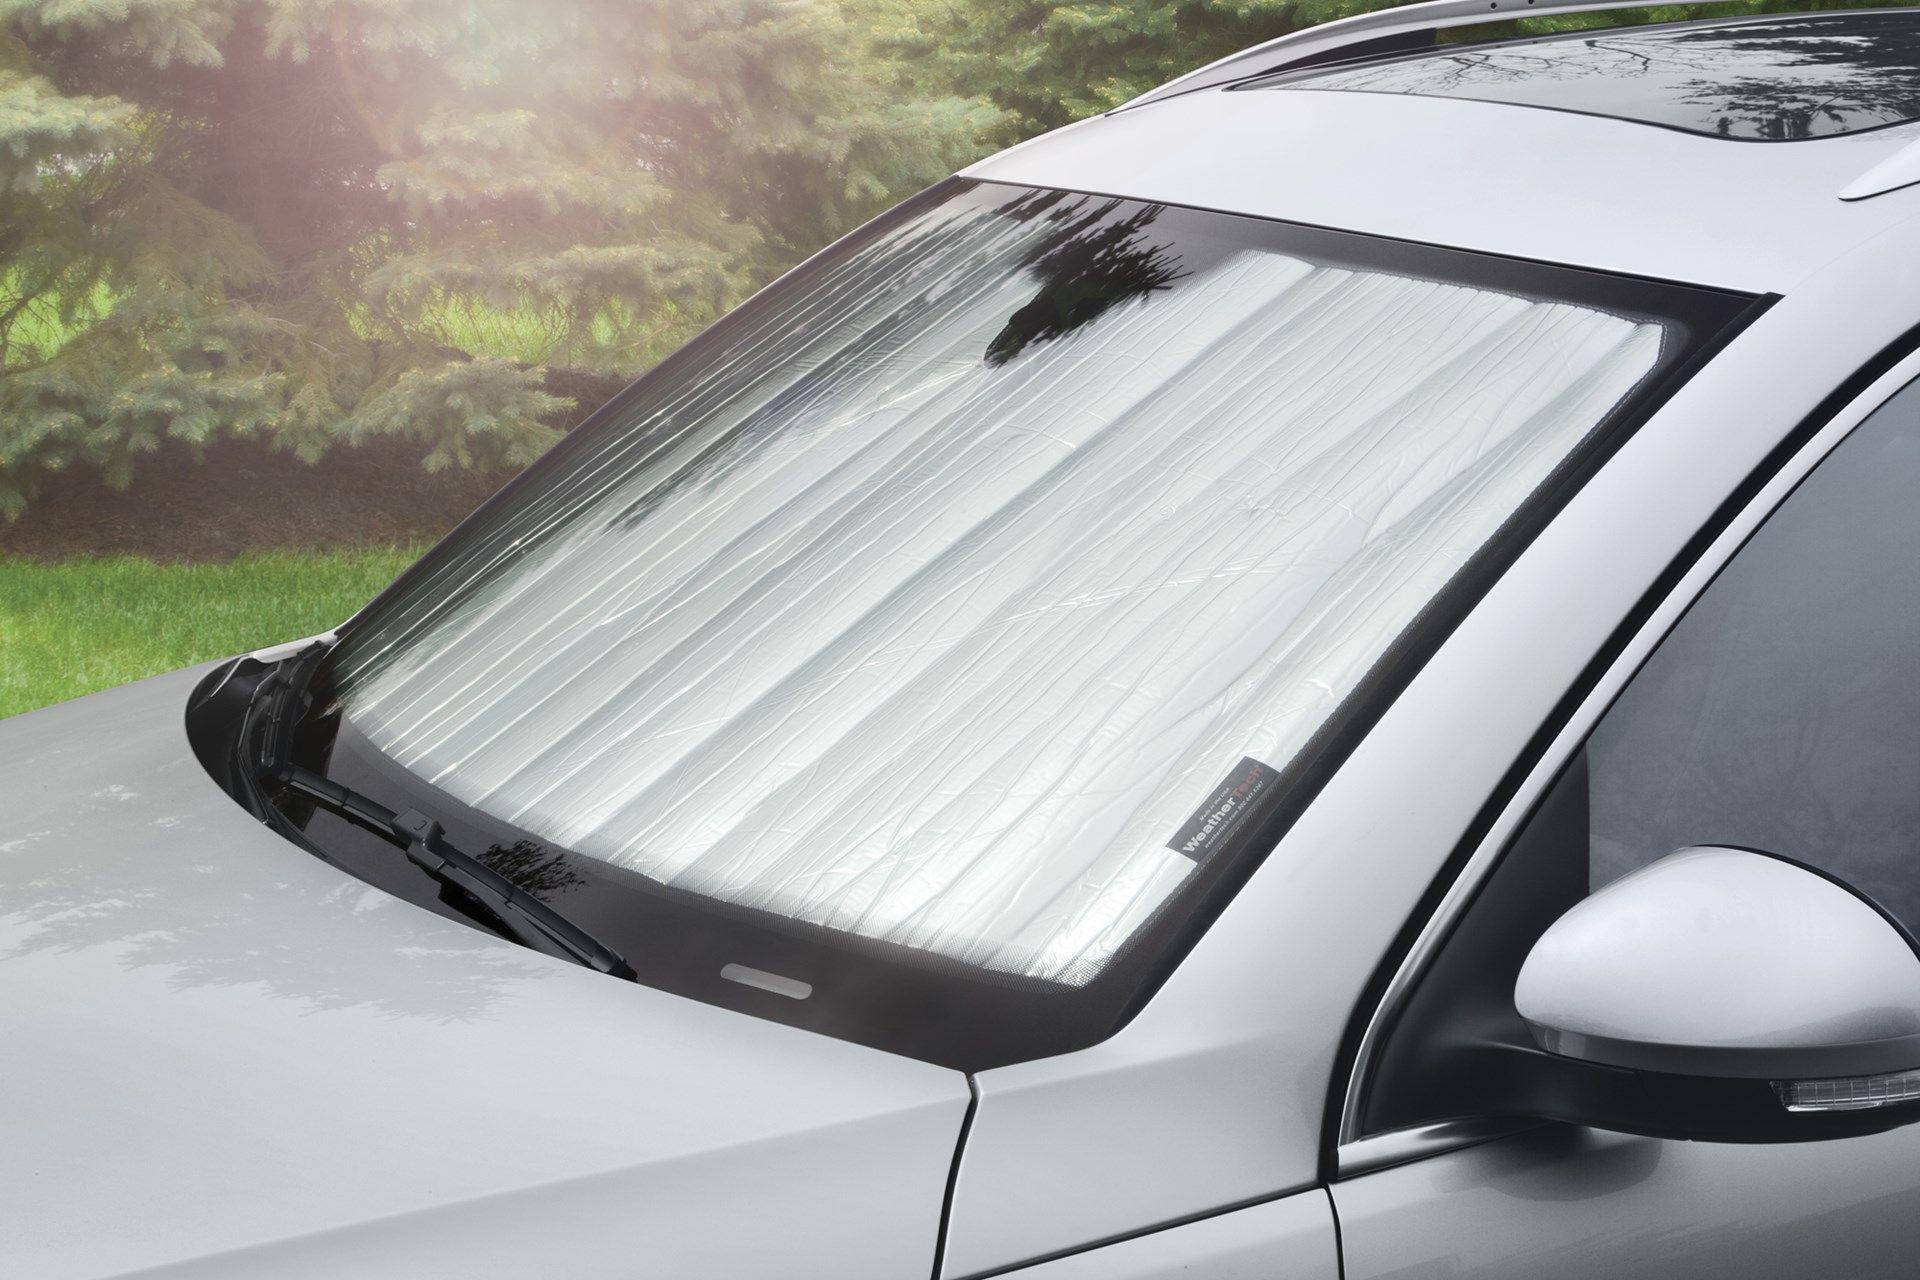 Weathertech Com Windshield Sun Shade Weather Tech Toyota Prius